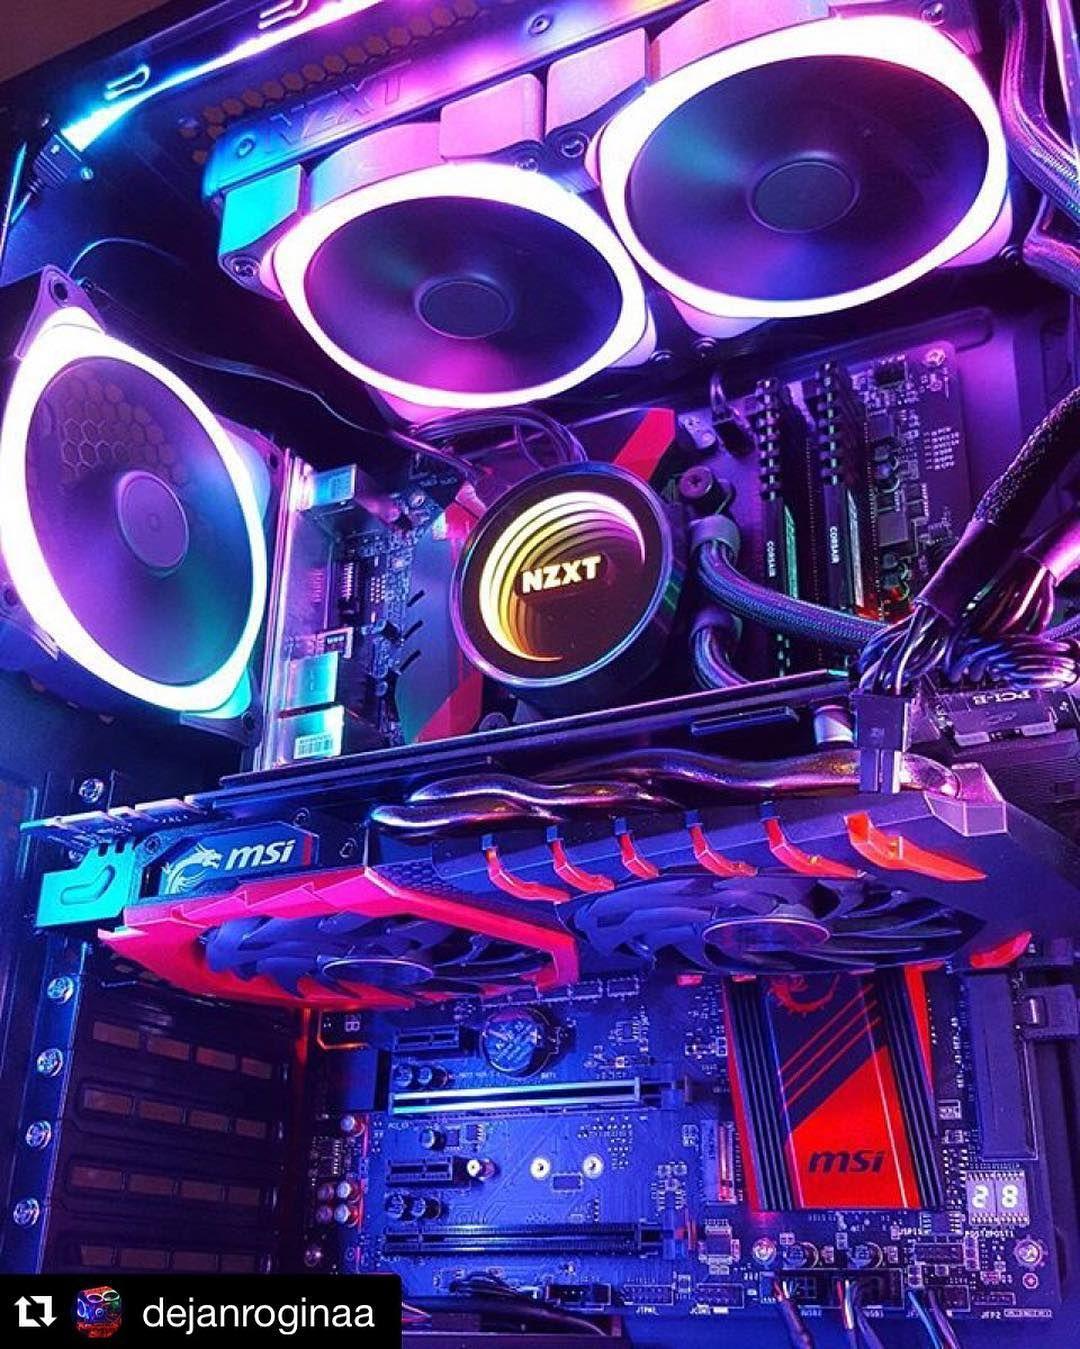 #NZXT Aer #RGB fans and Kraken CPU liquid cooler looking ...